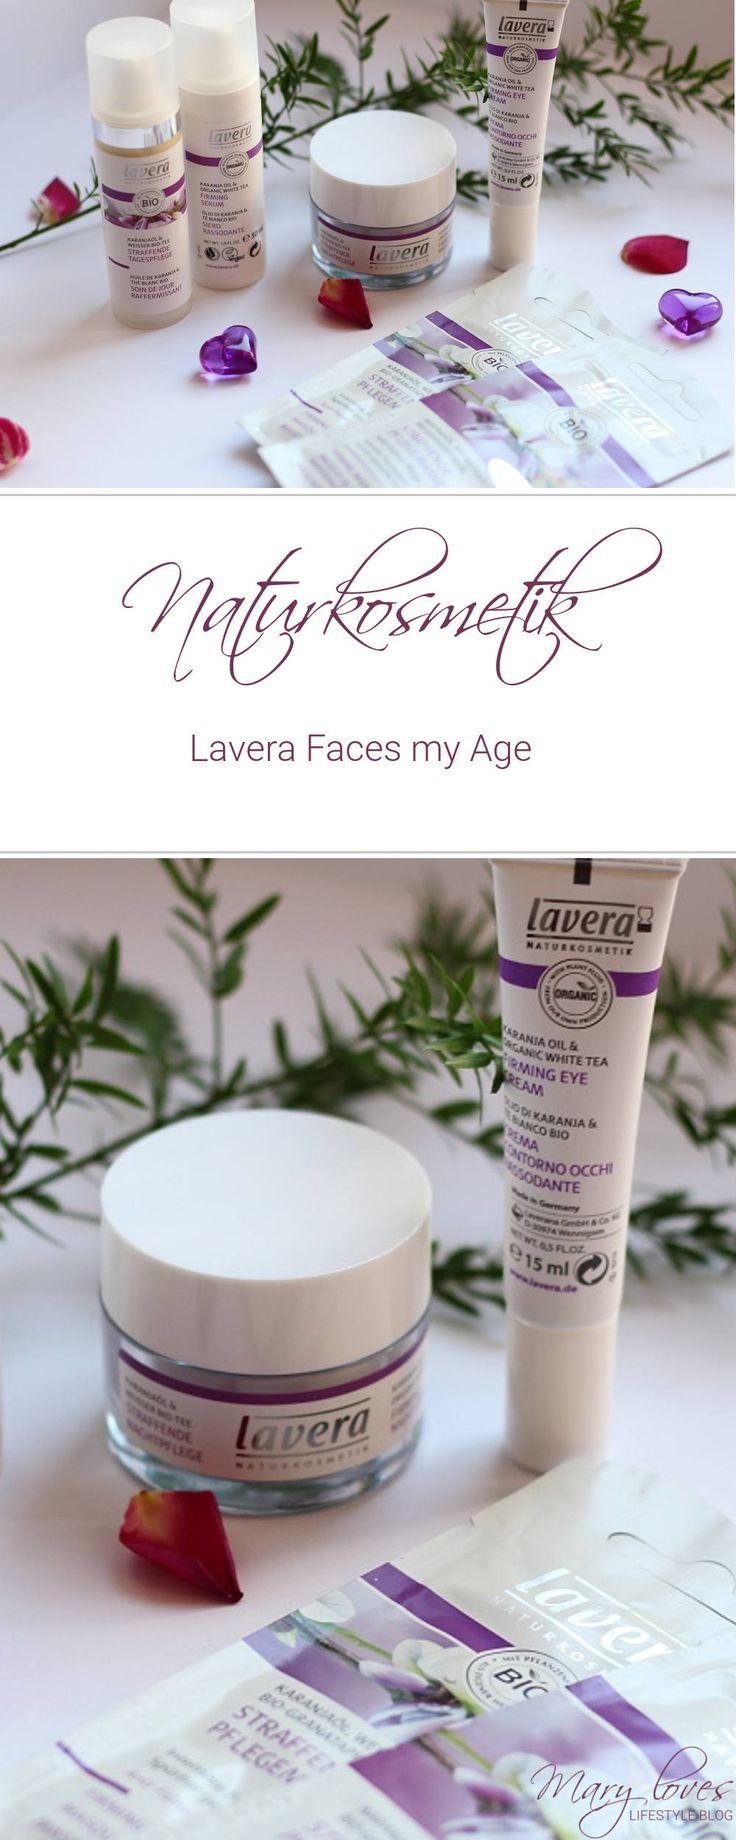 Naturkosmetik - Lavera Faces my Age